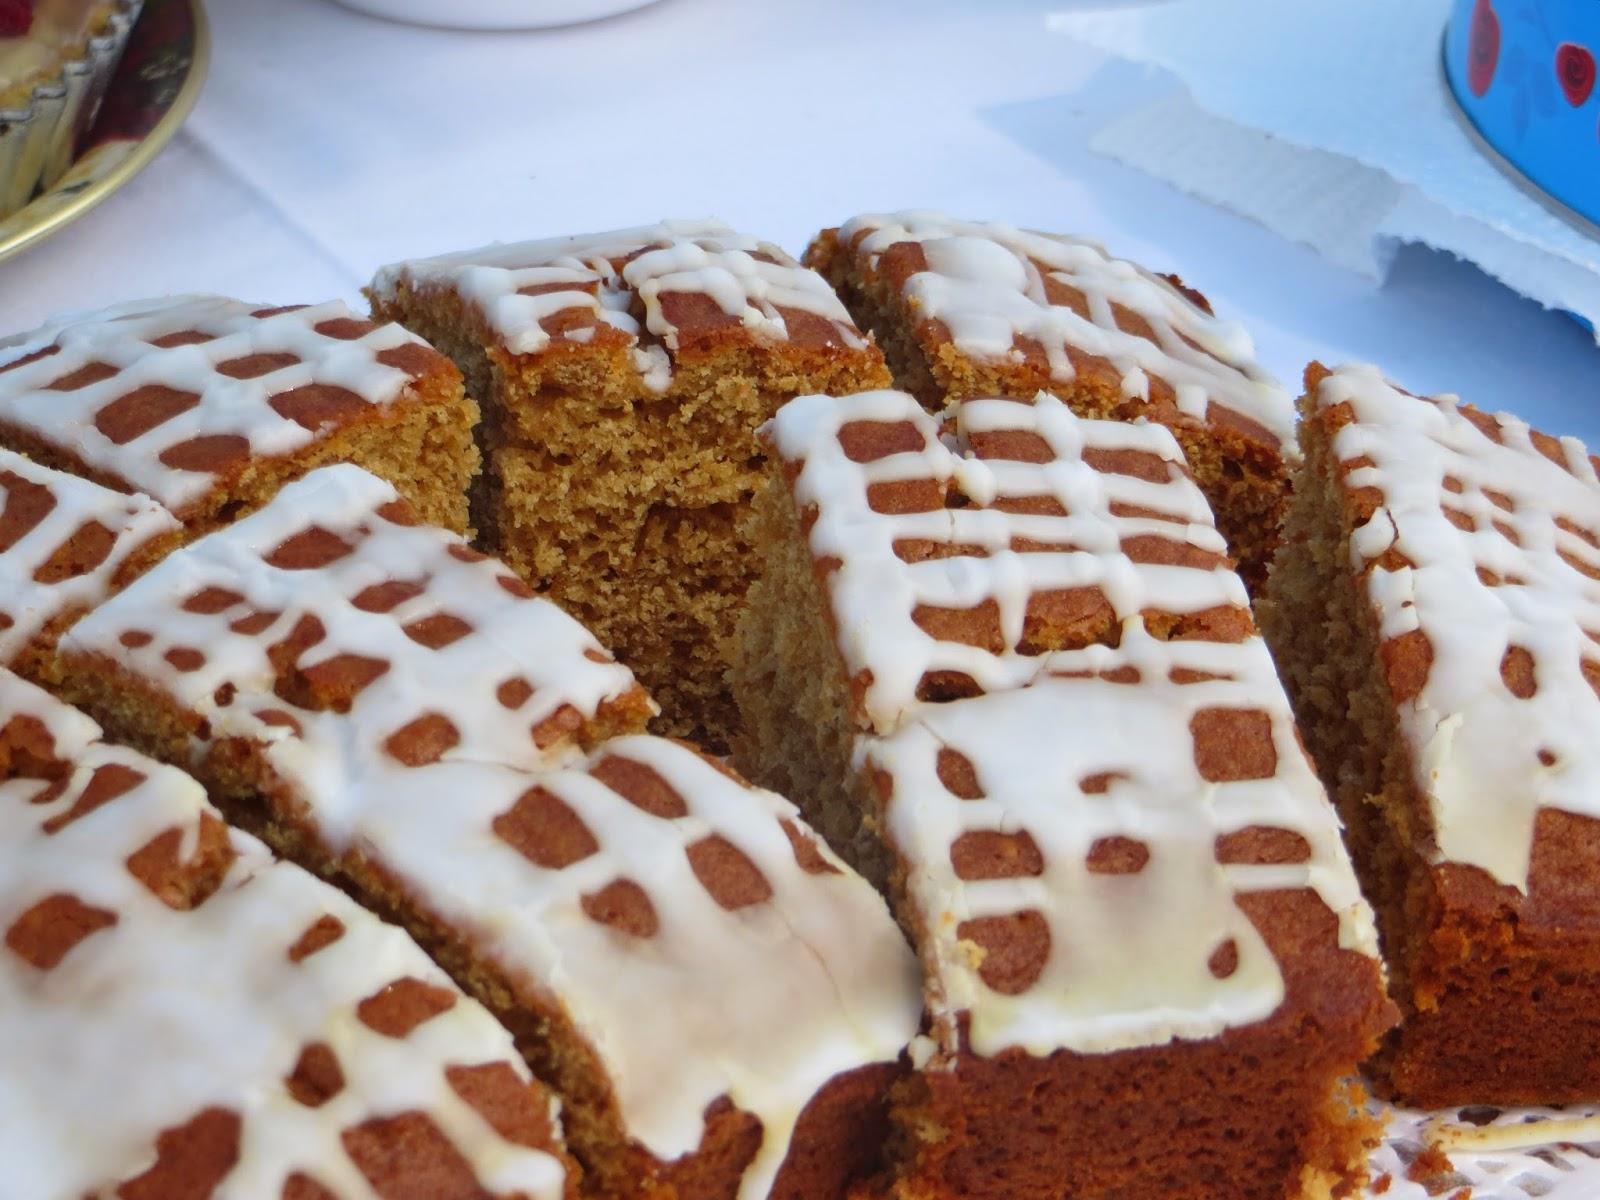 Homemade Spiced cake, available fot £1  slice.